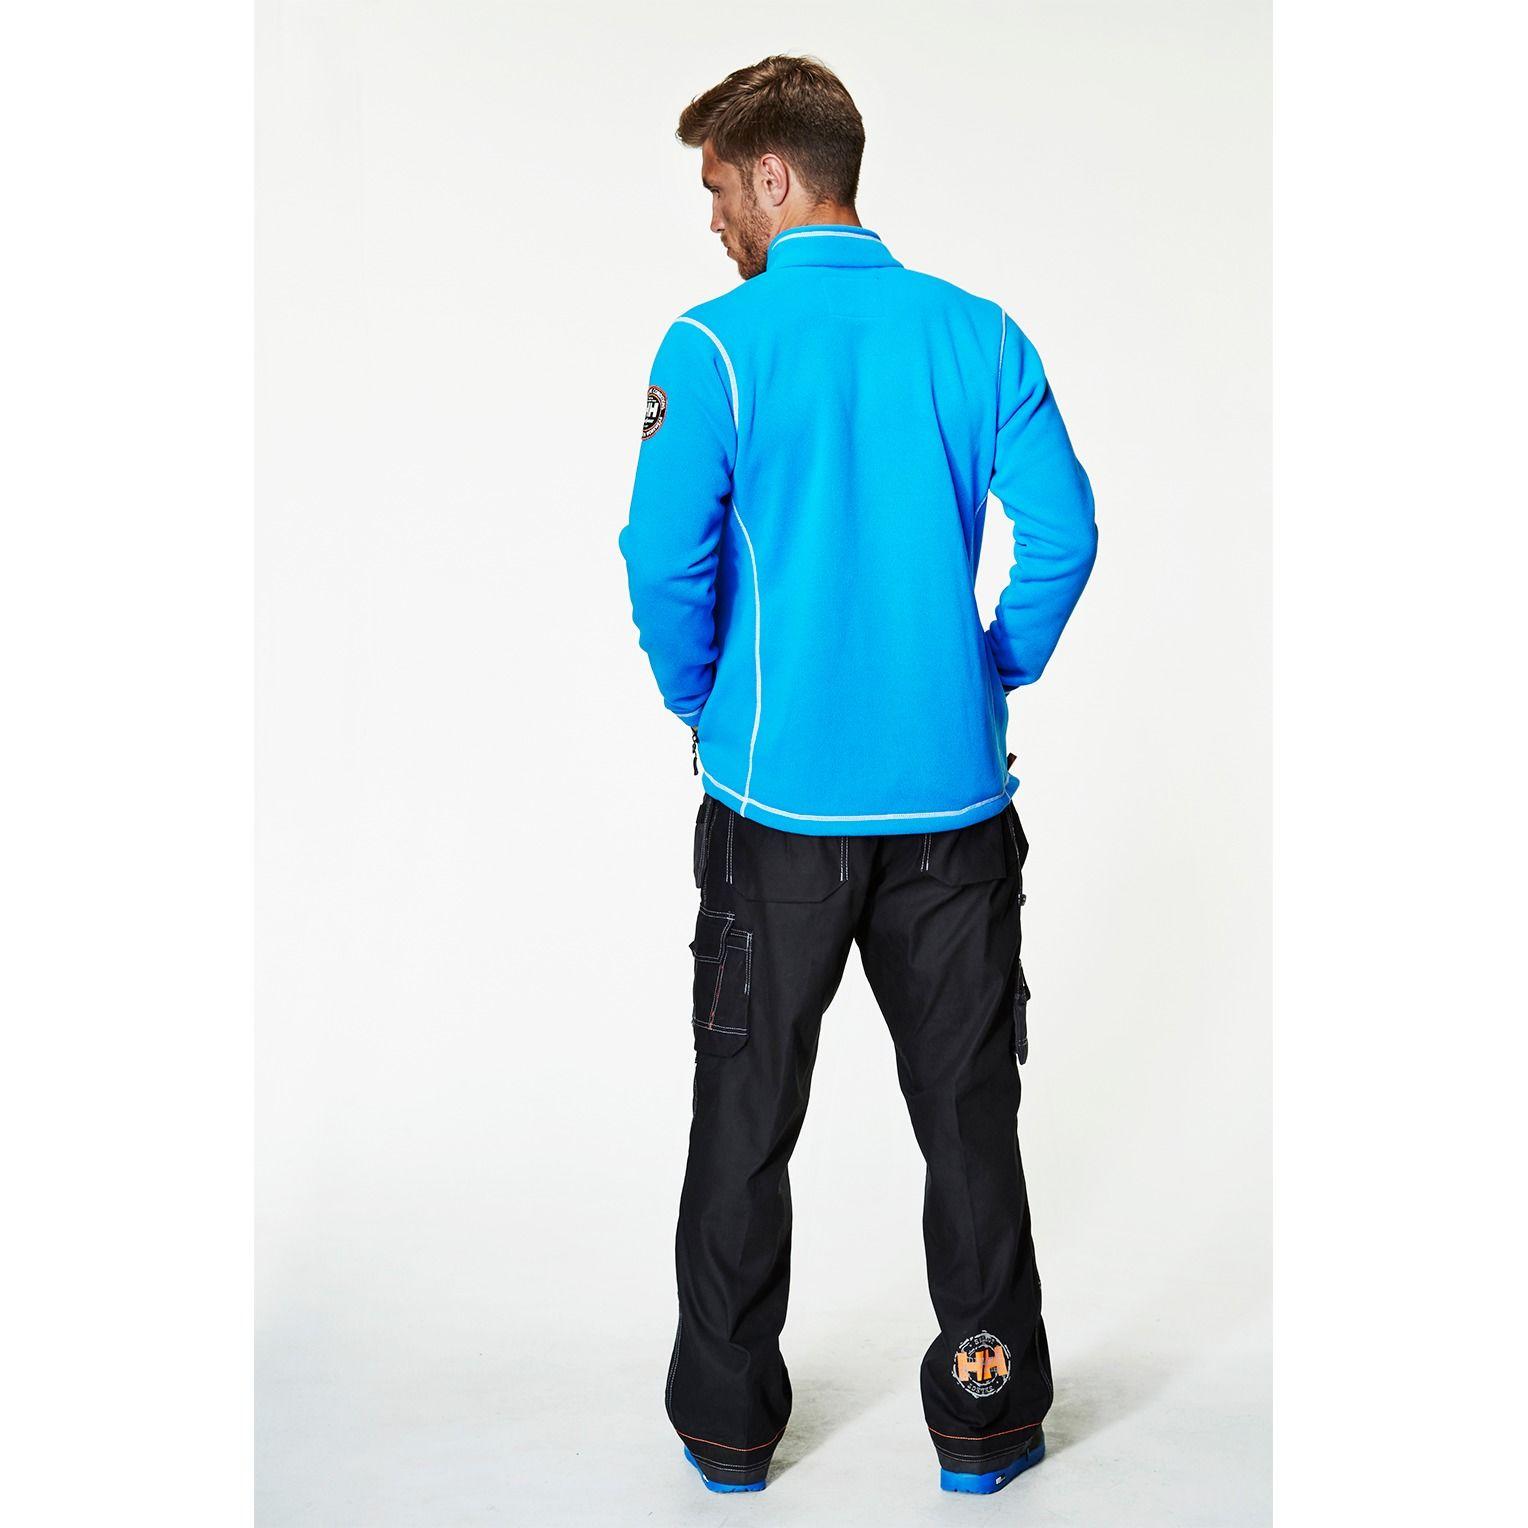 de776669 hay river jacket/arbeidstøy/arbeidsjakke/helly hansen/haugseng.no